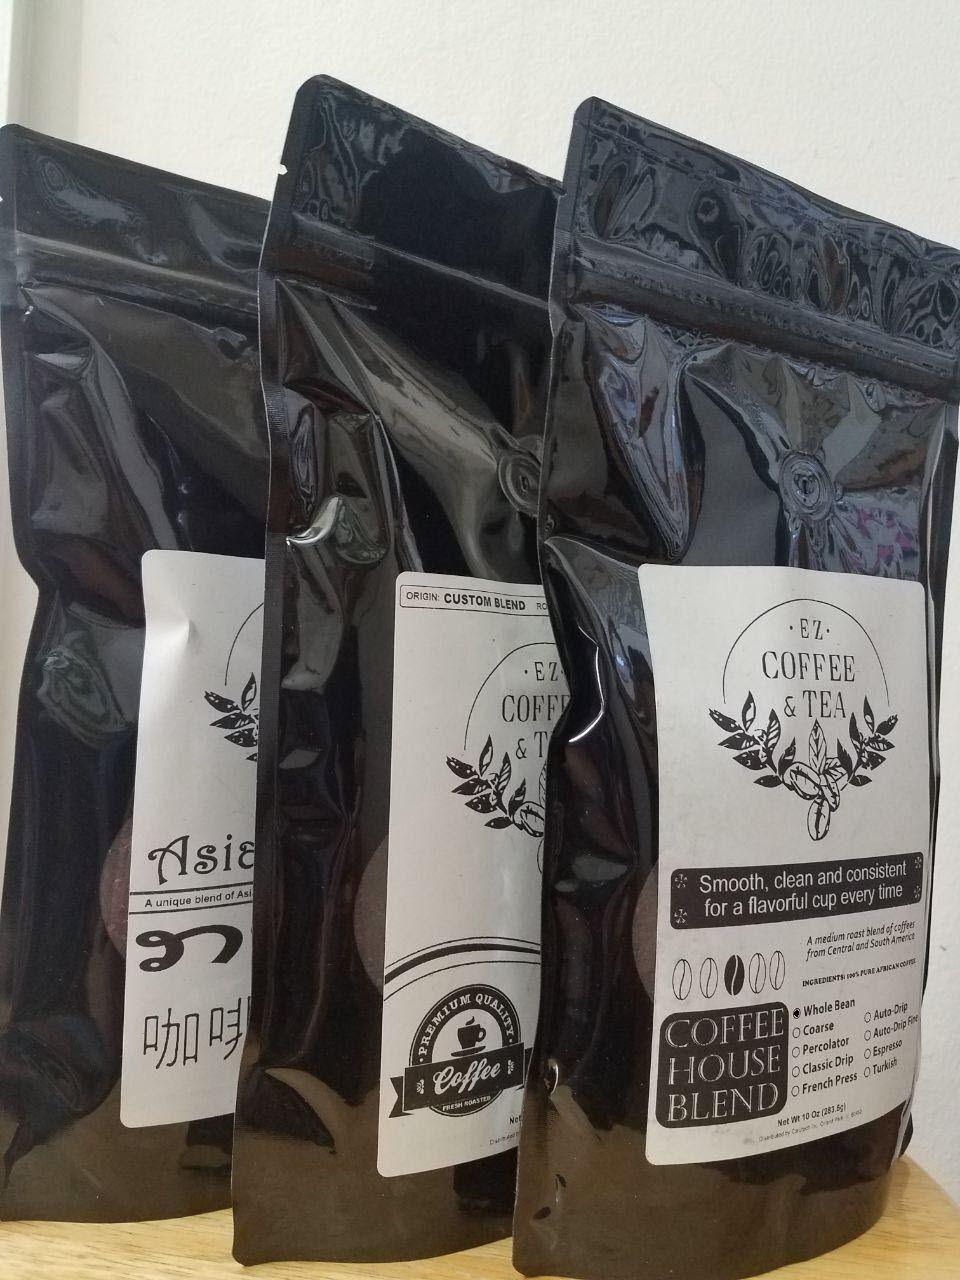 EZ Coffee and Tea Any 3 bag/pack Whole Bean Coffee 10 oz